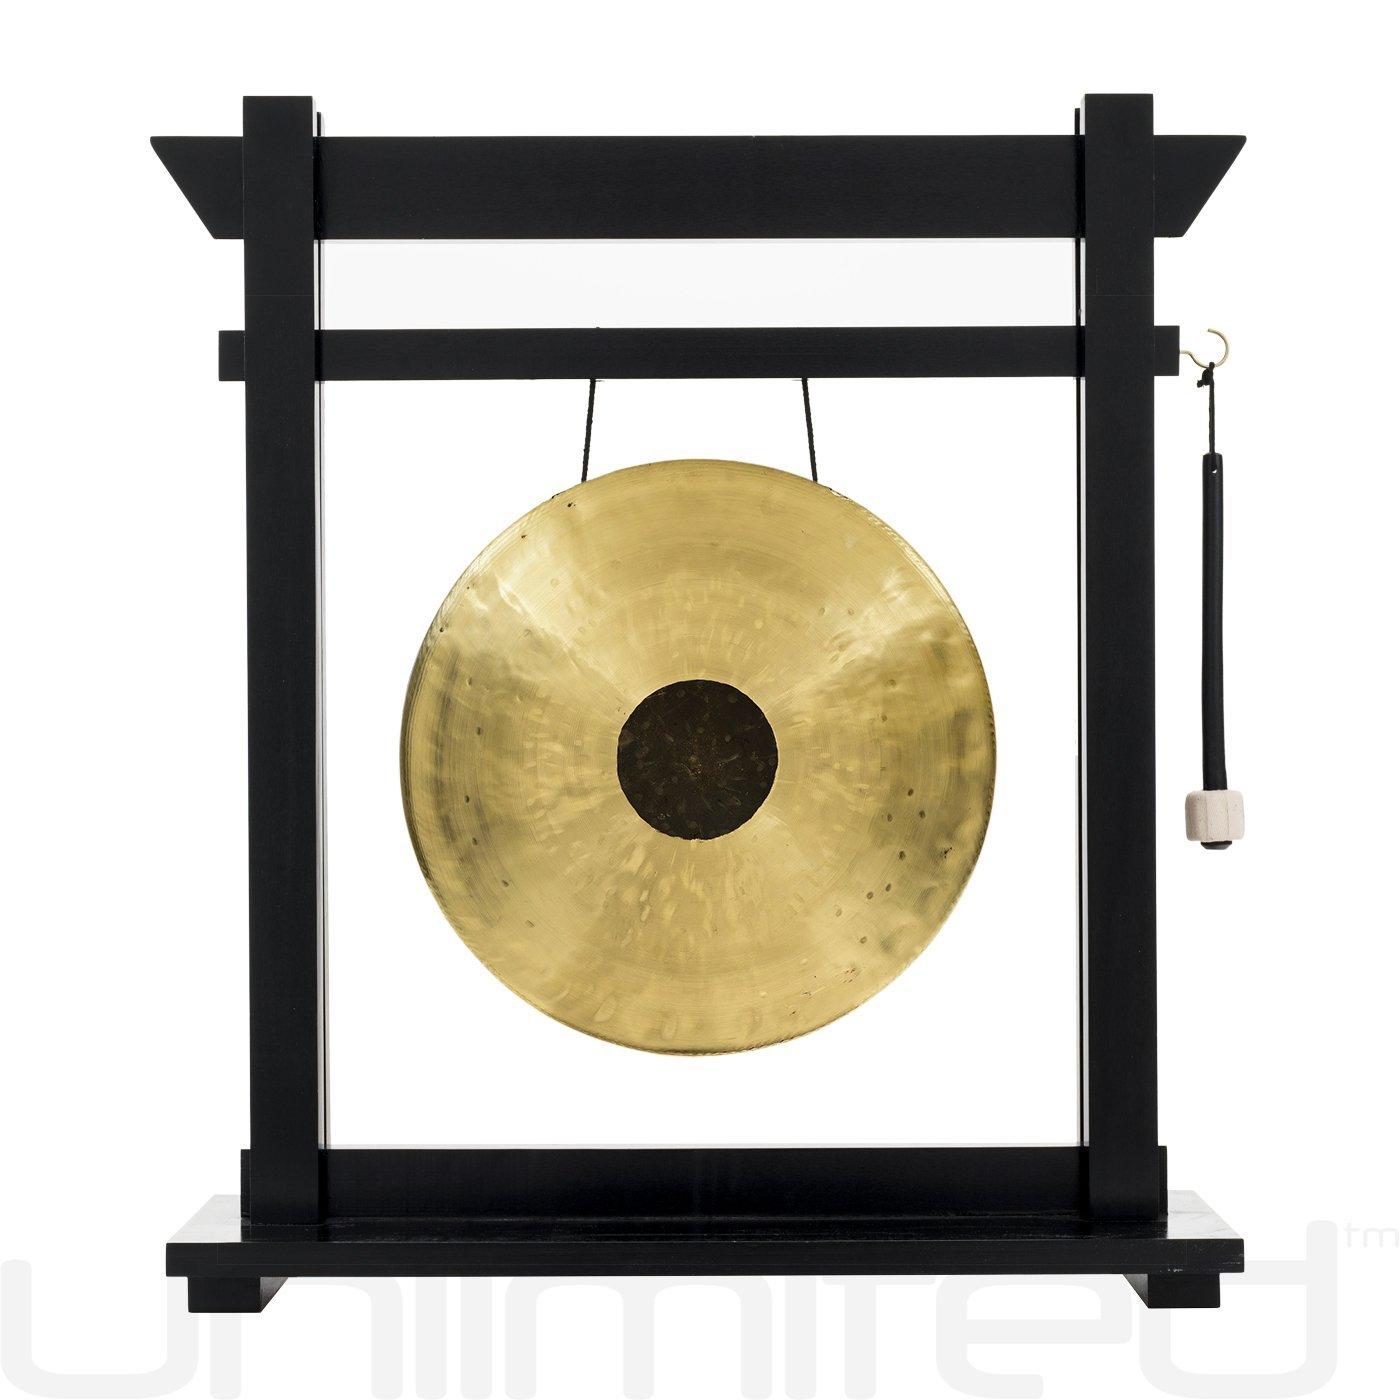 14'' Gongs on the Moksha Joe Gong Stand - Black